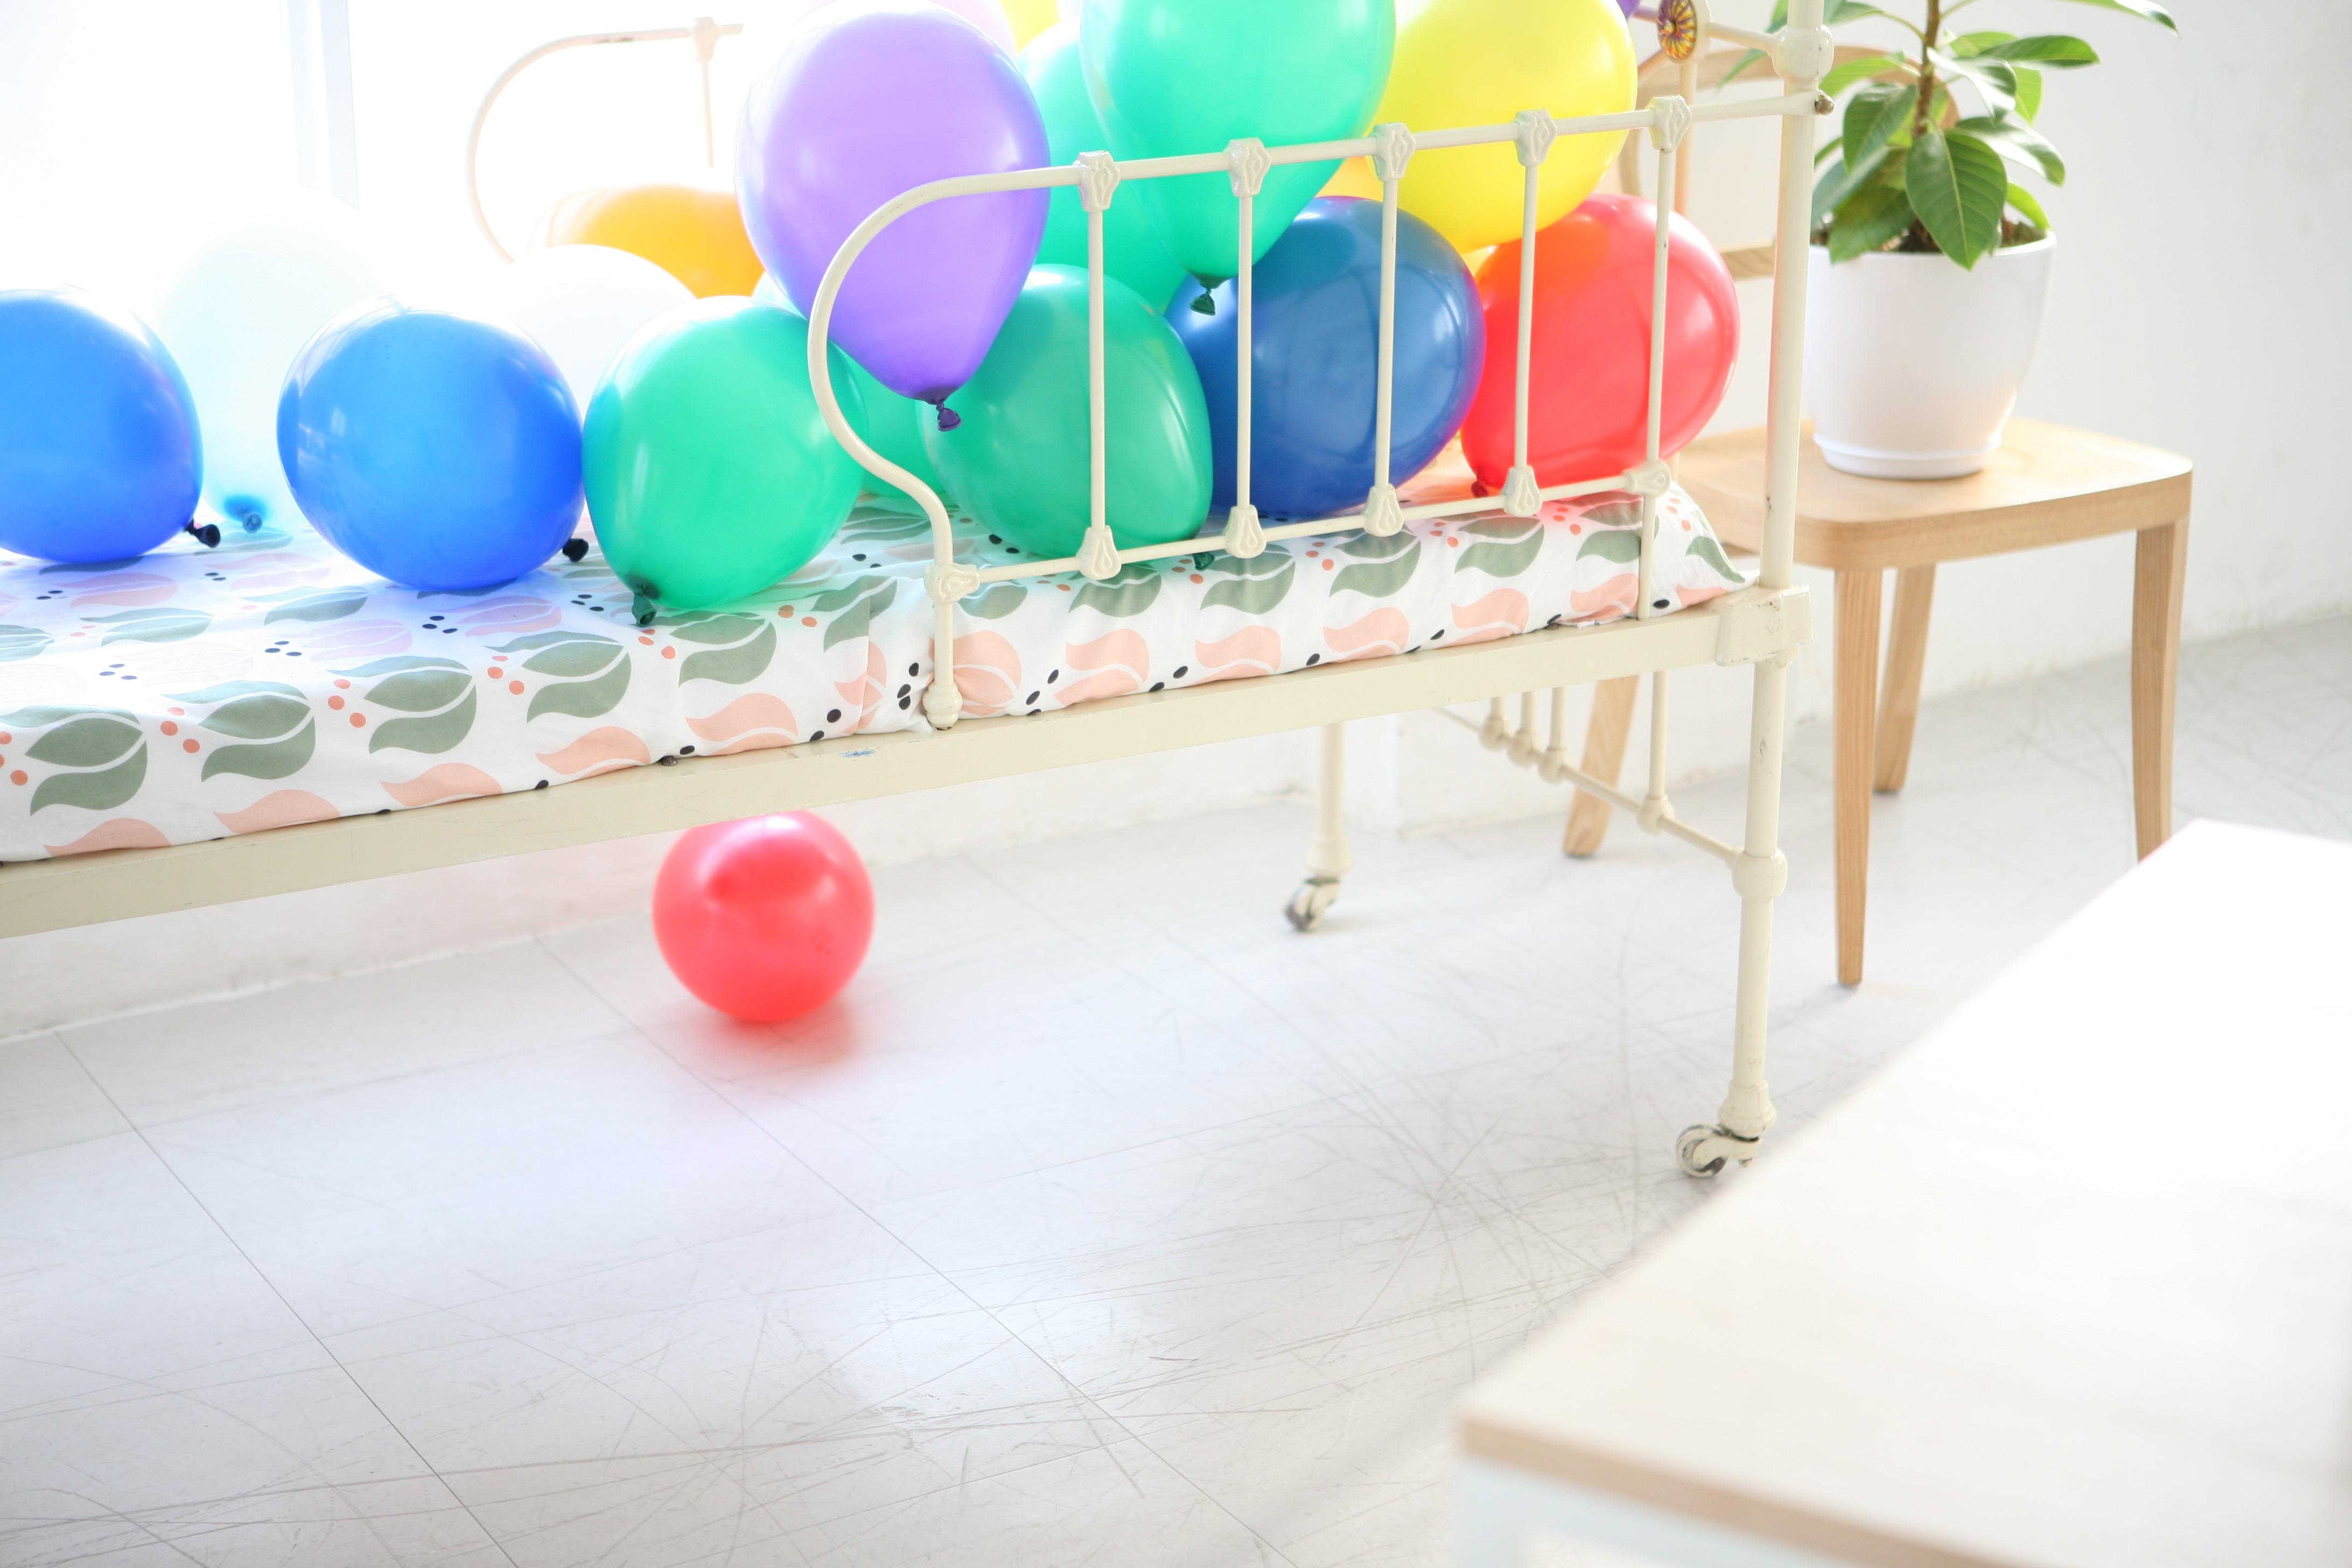 Produktdesign Möbel kostenlose foto tabelle spielen kunststoff stock ballon möbel